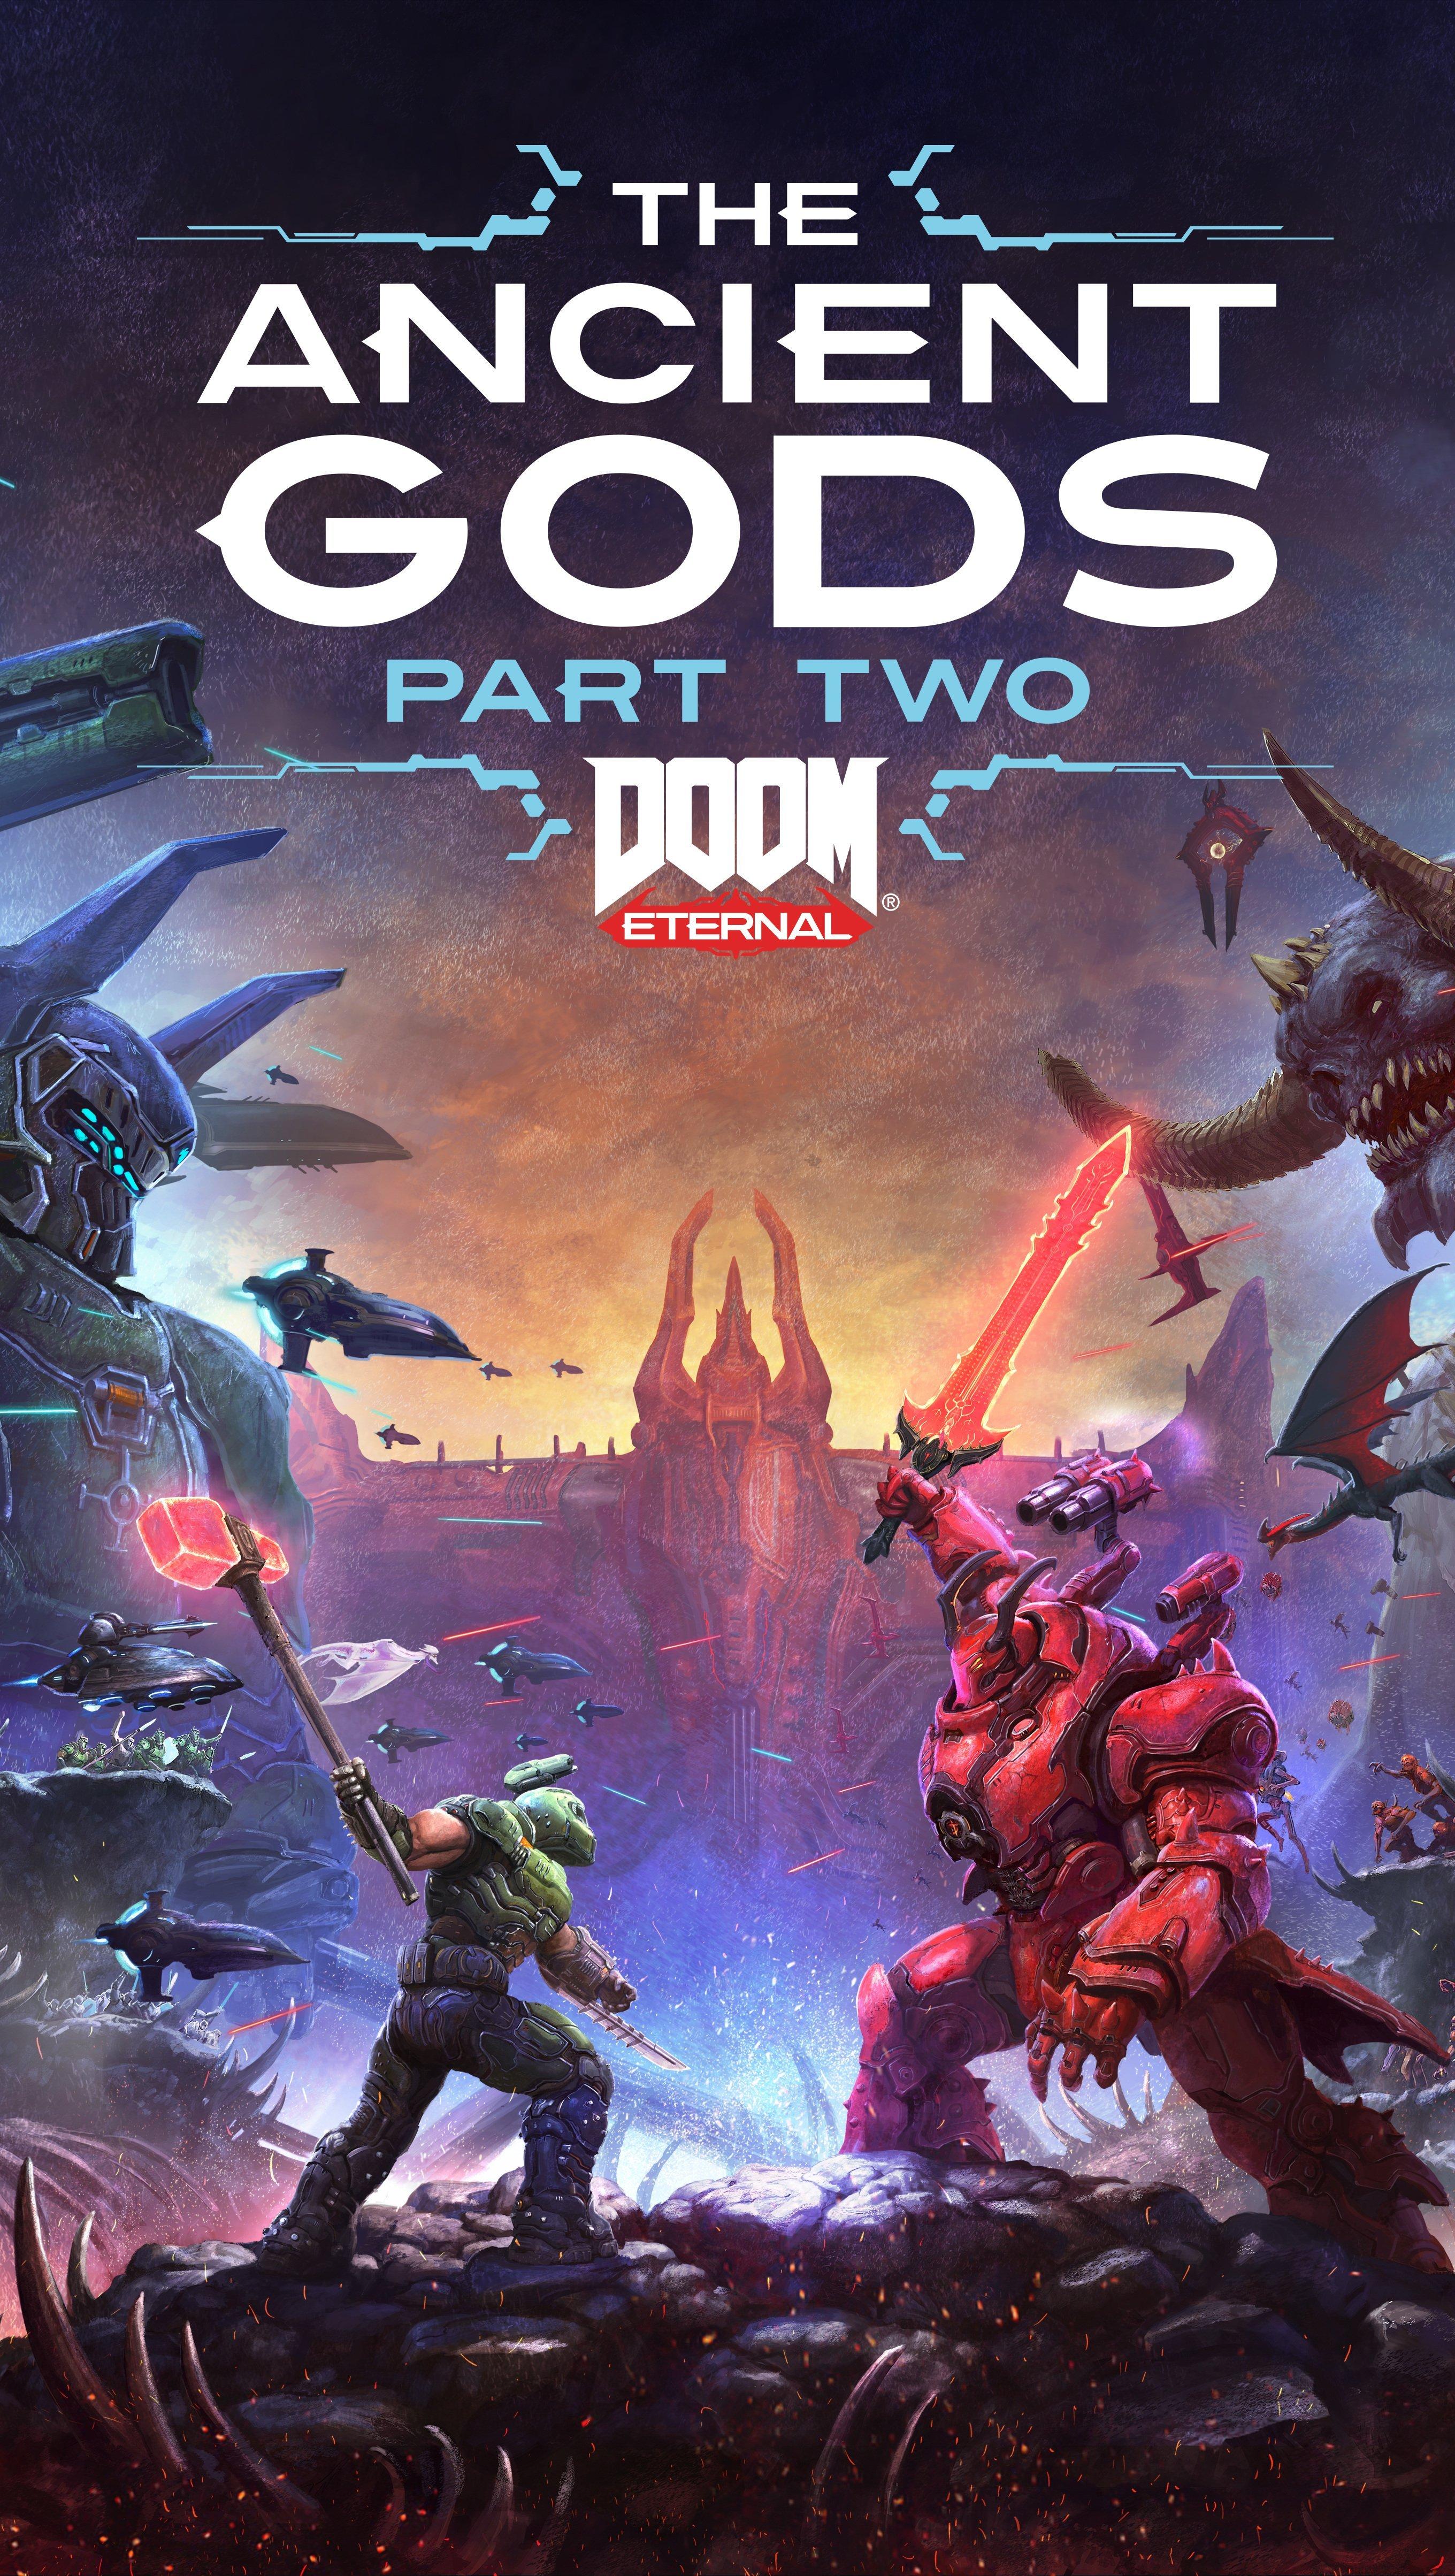 Fondos de pantalla Doom Eternal The Ancient Gods Part Two Vertical